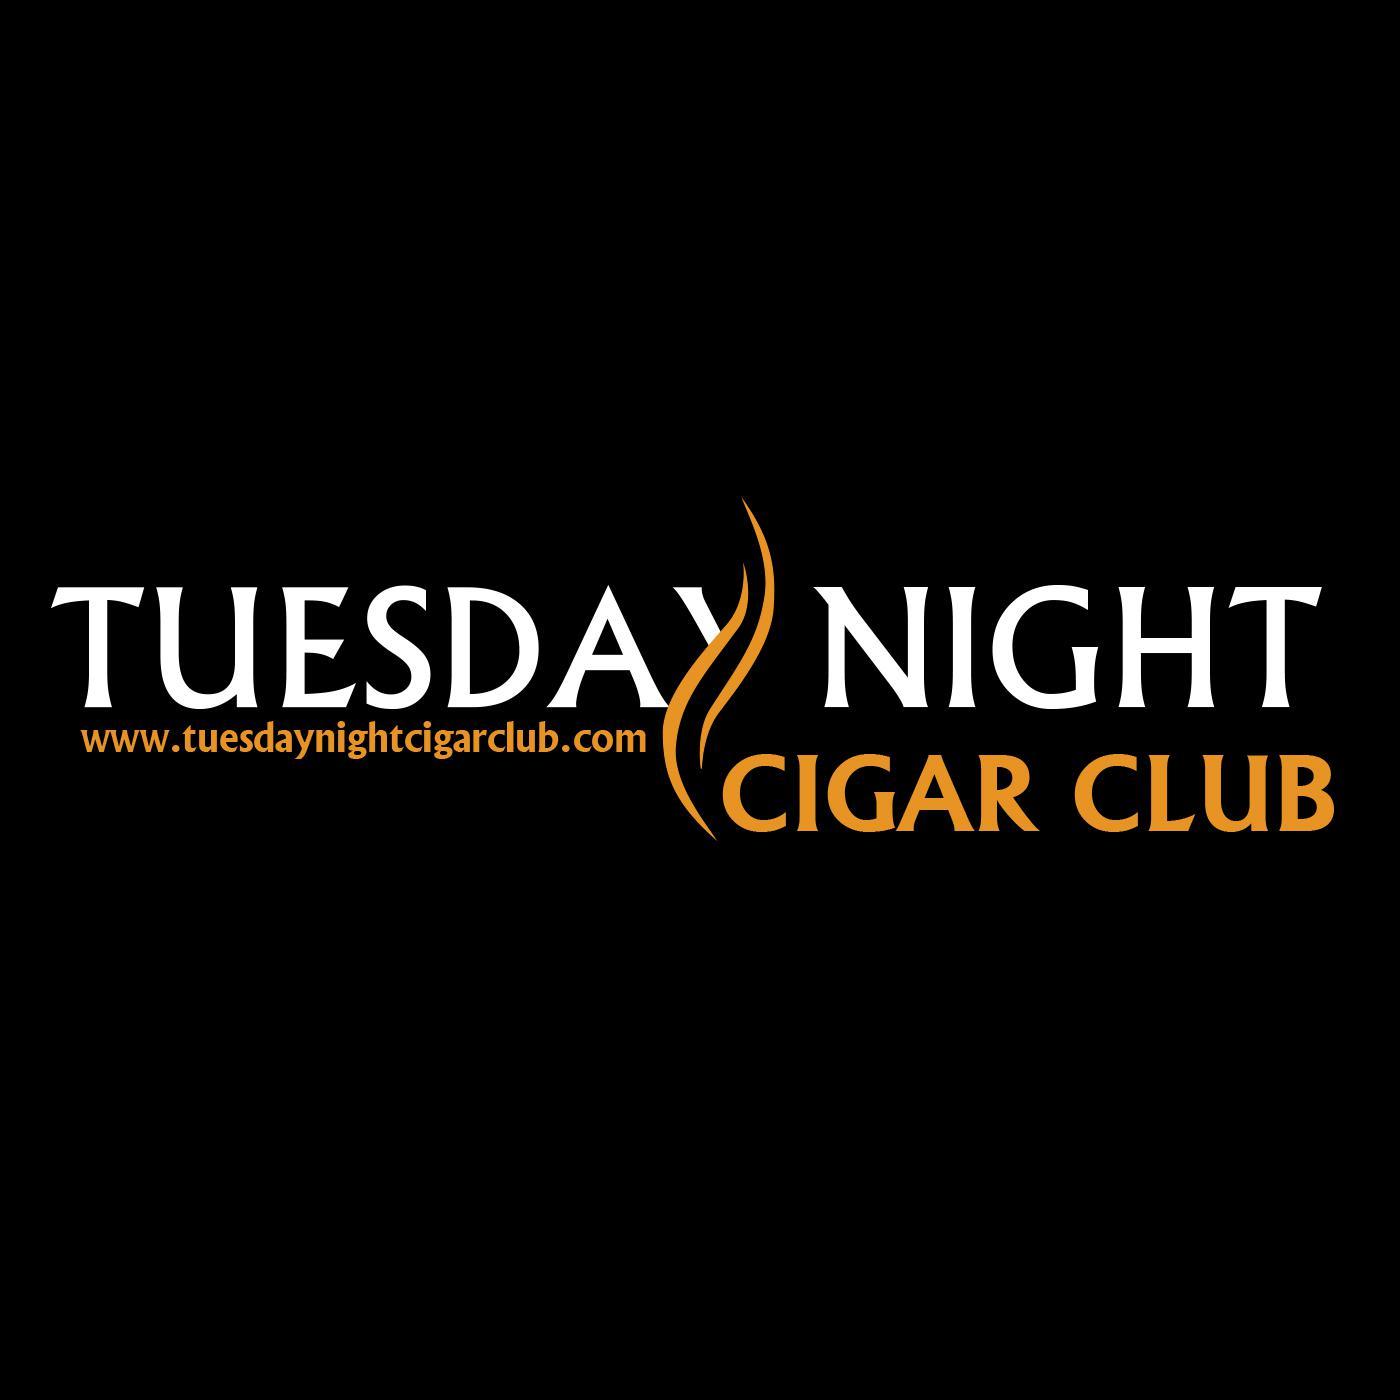 Tuesday Night Cigar Club (podcast) - Tuesday Night Cigar